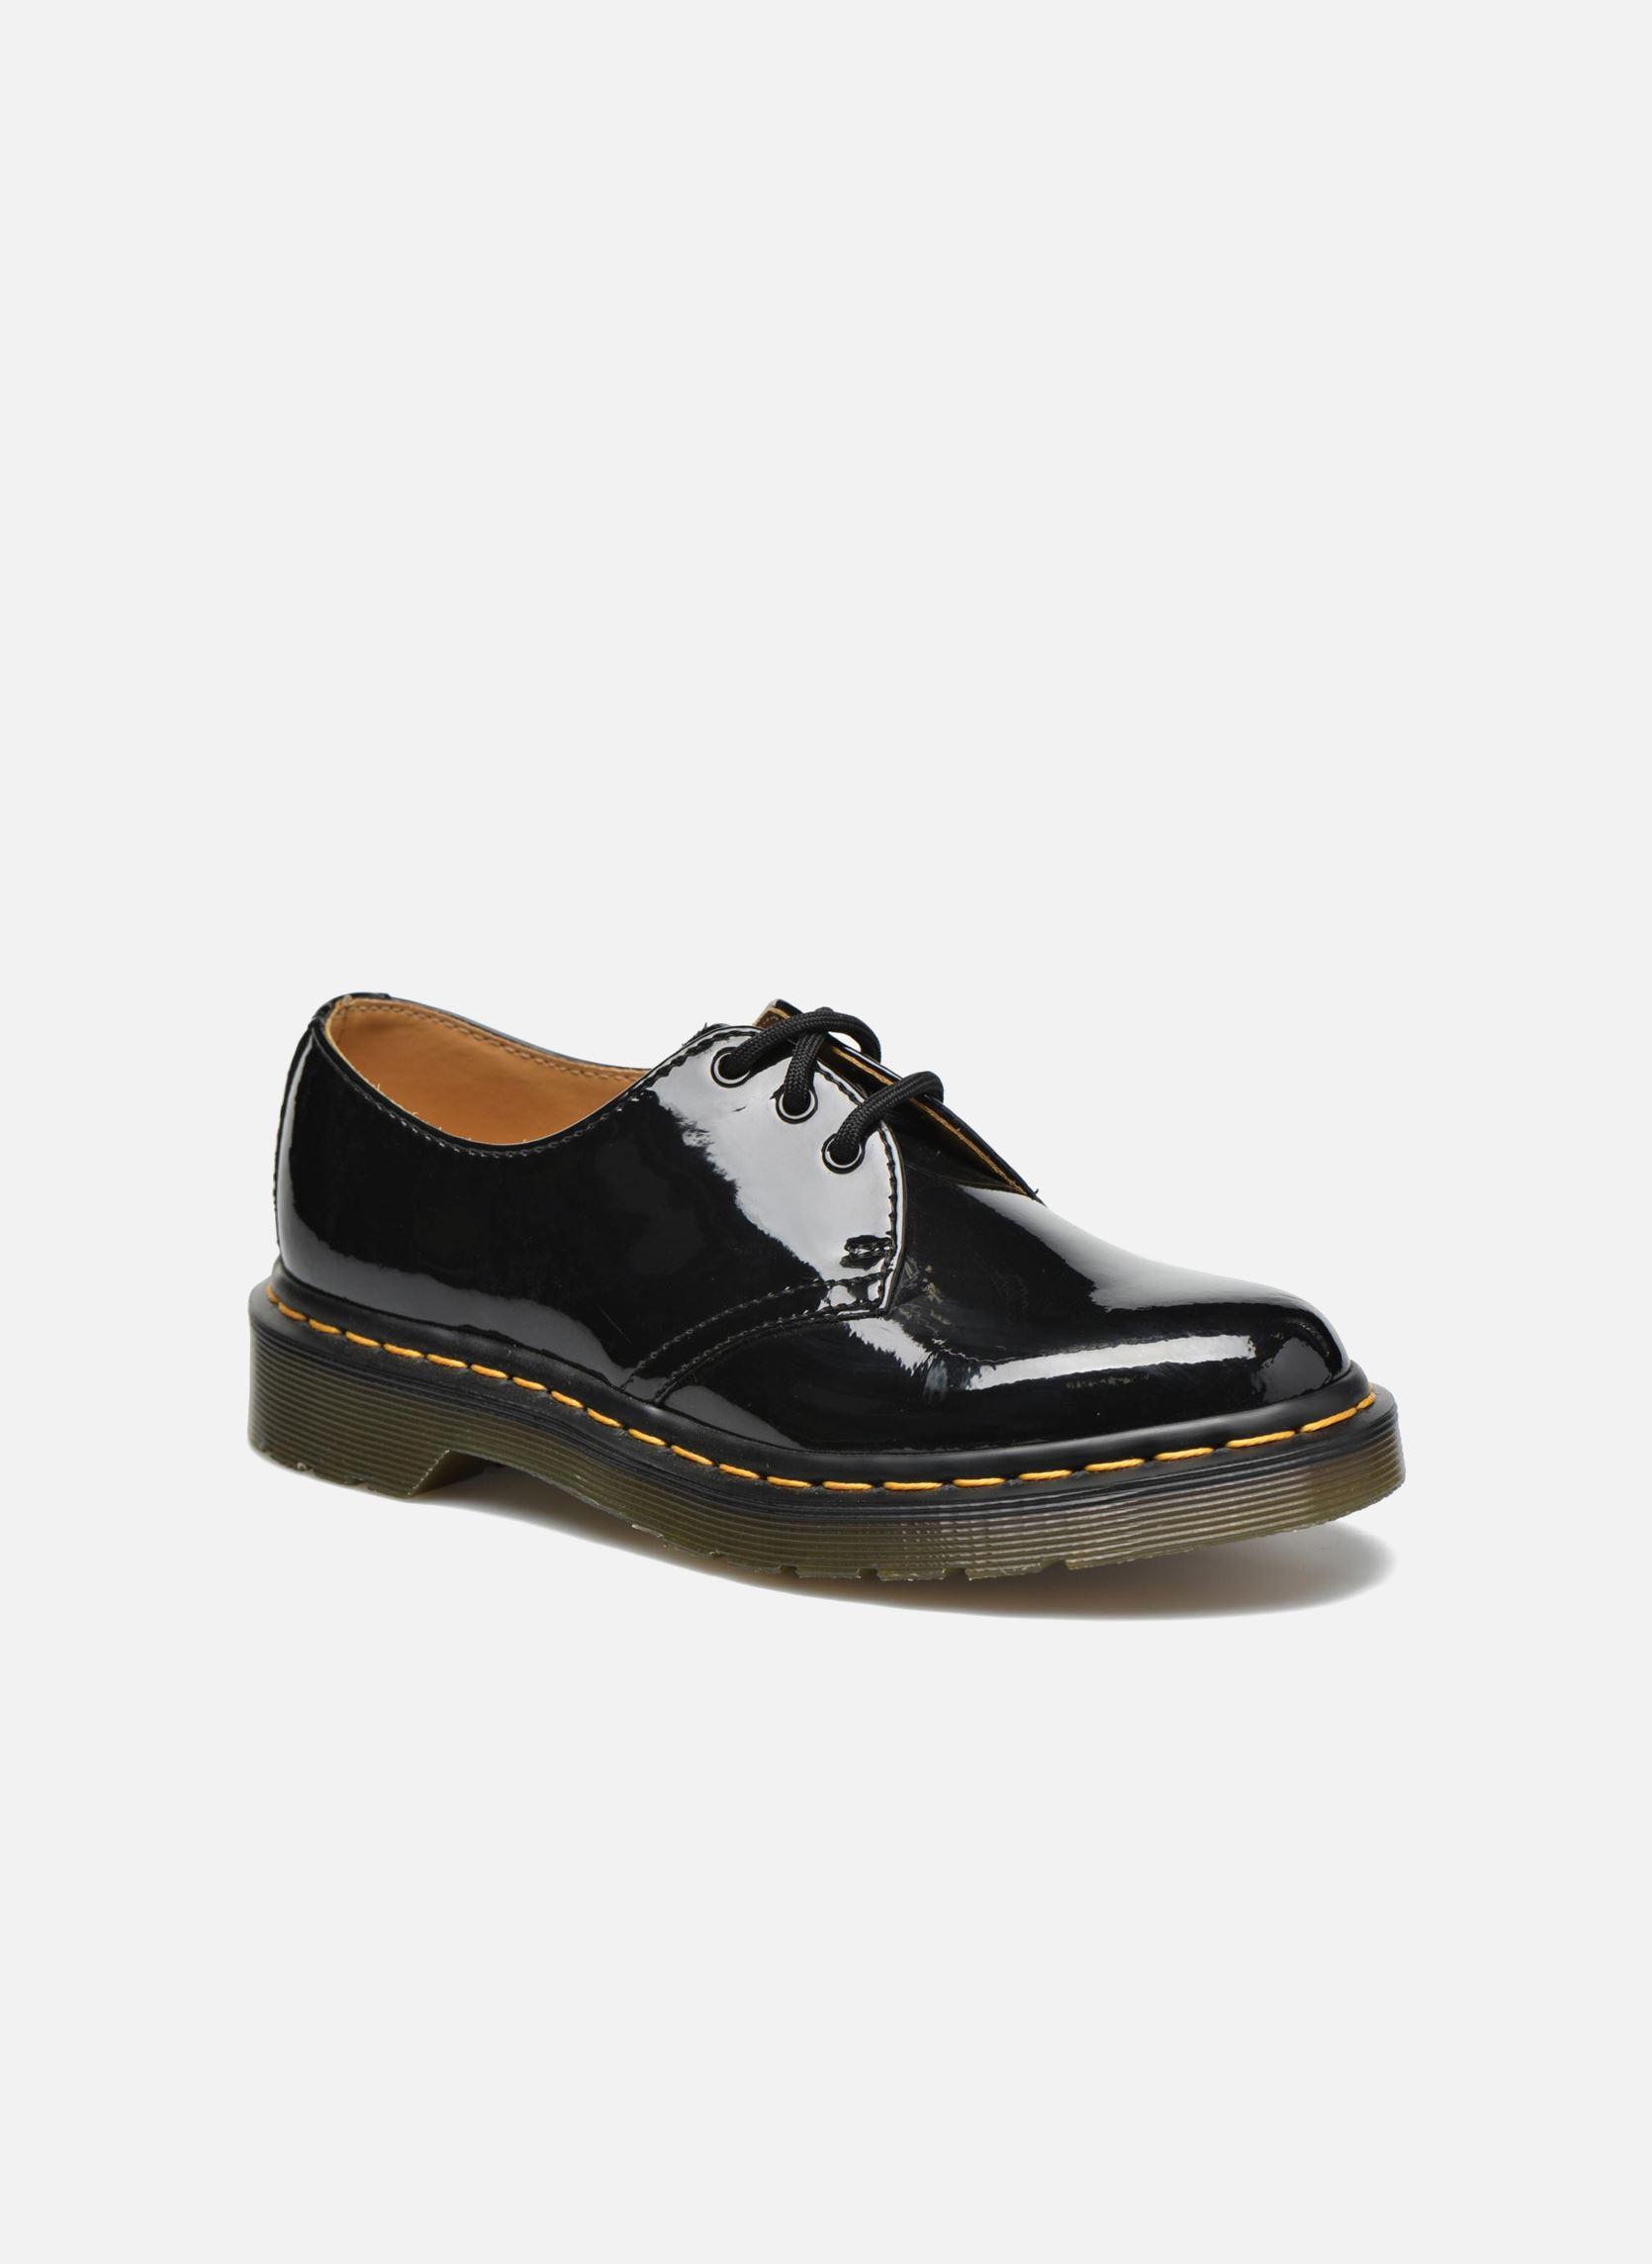 adidas schoenen dames zwart sale